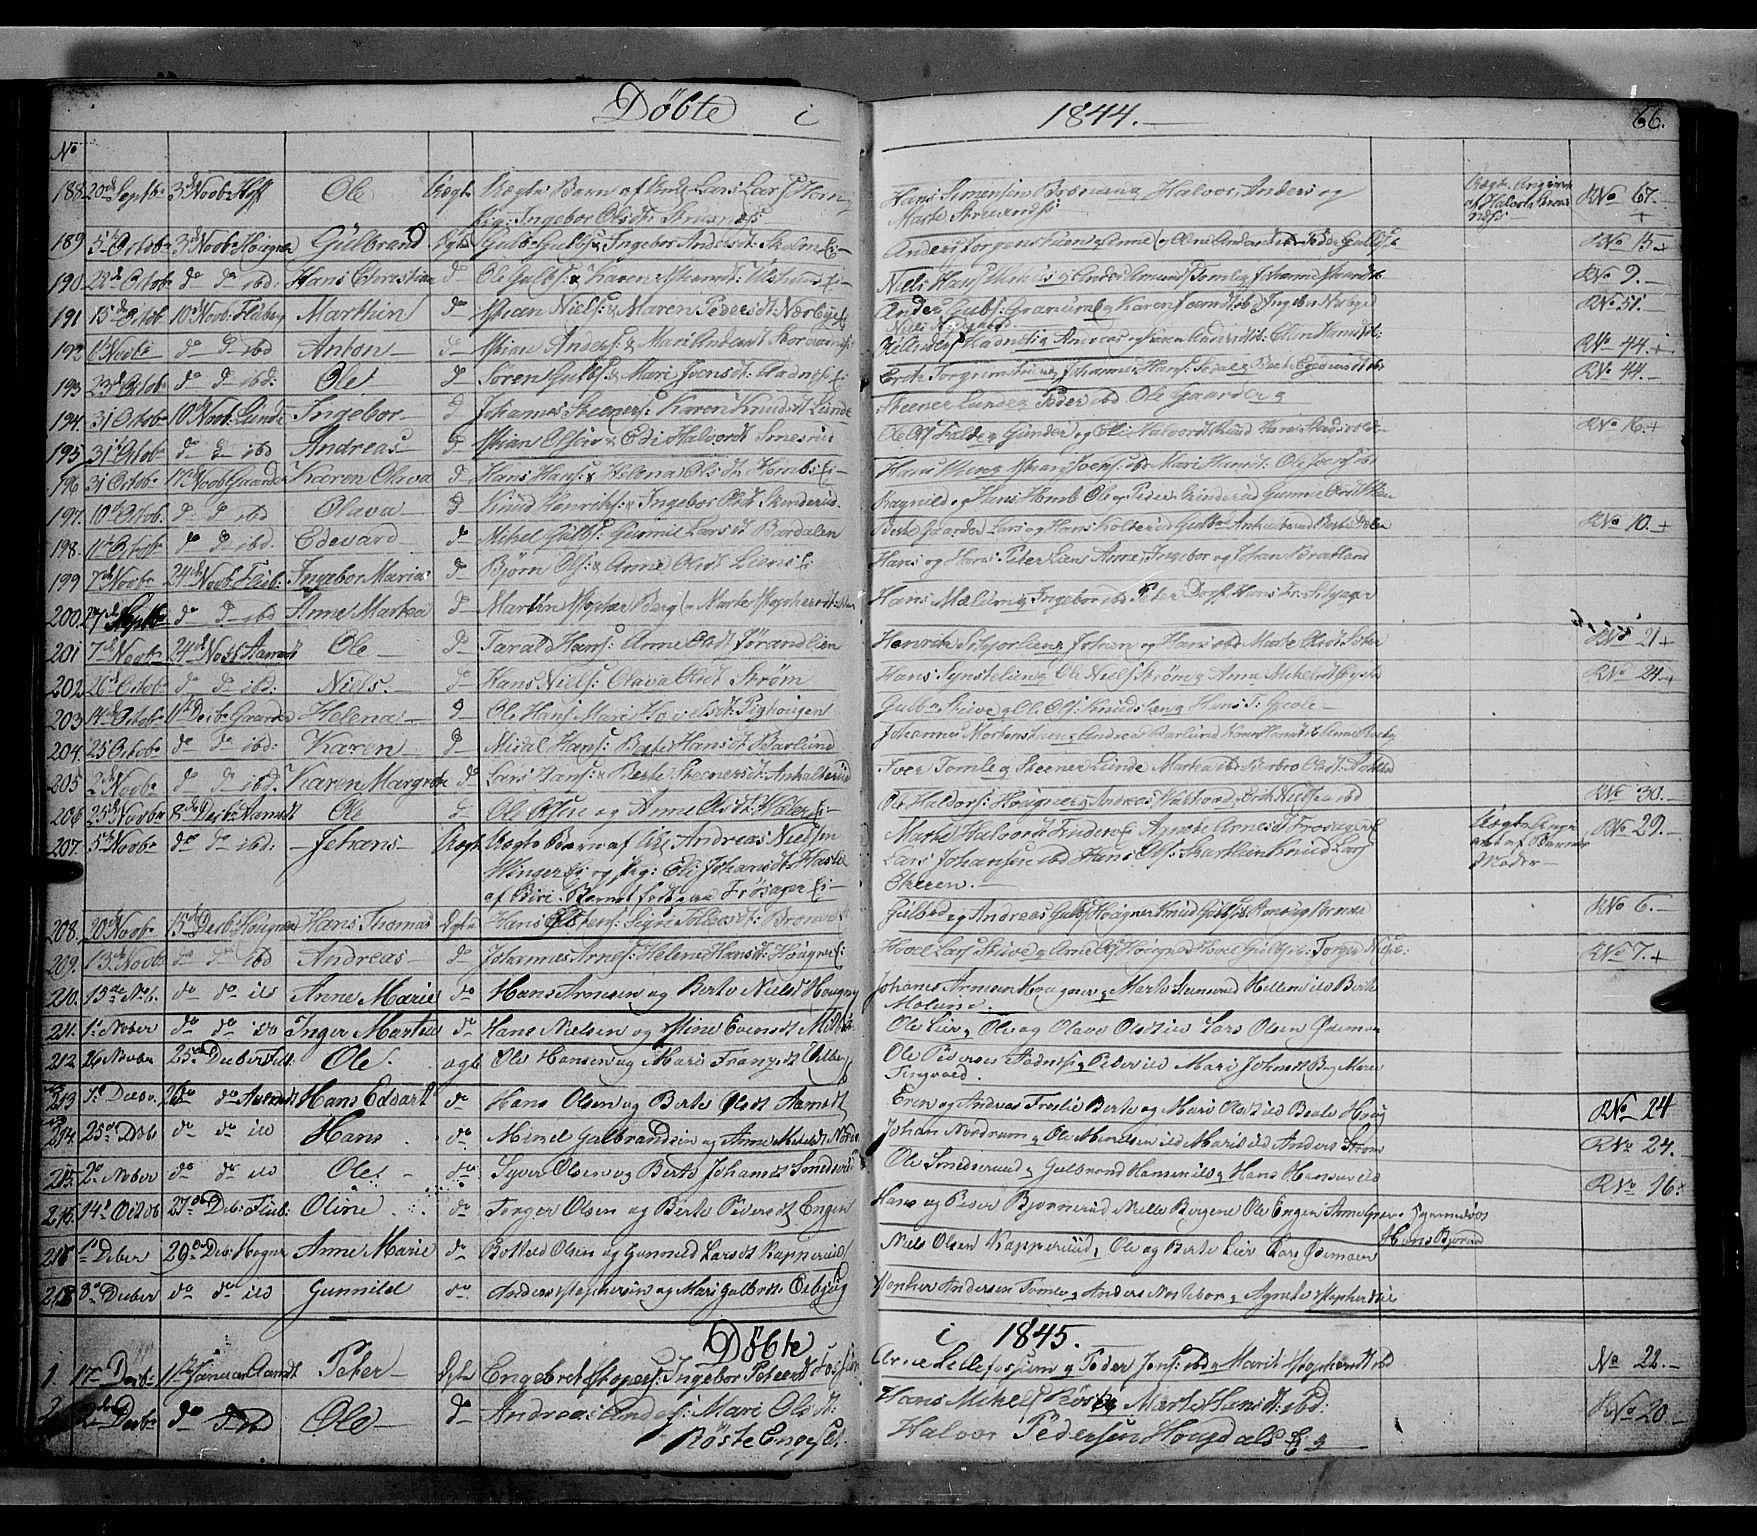 SAH, Land prestekontor, Klokkerbok nr. 2, 1833-1849, s. 66